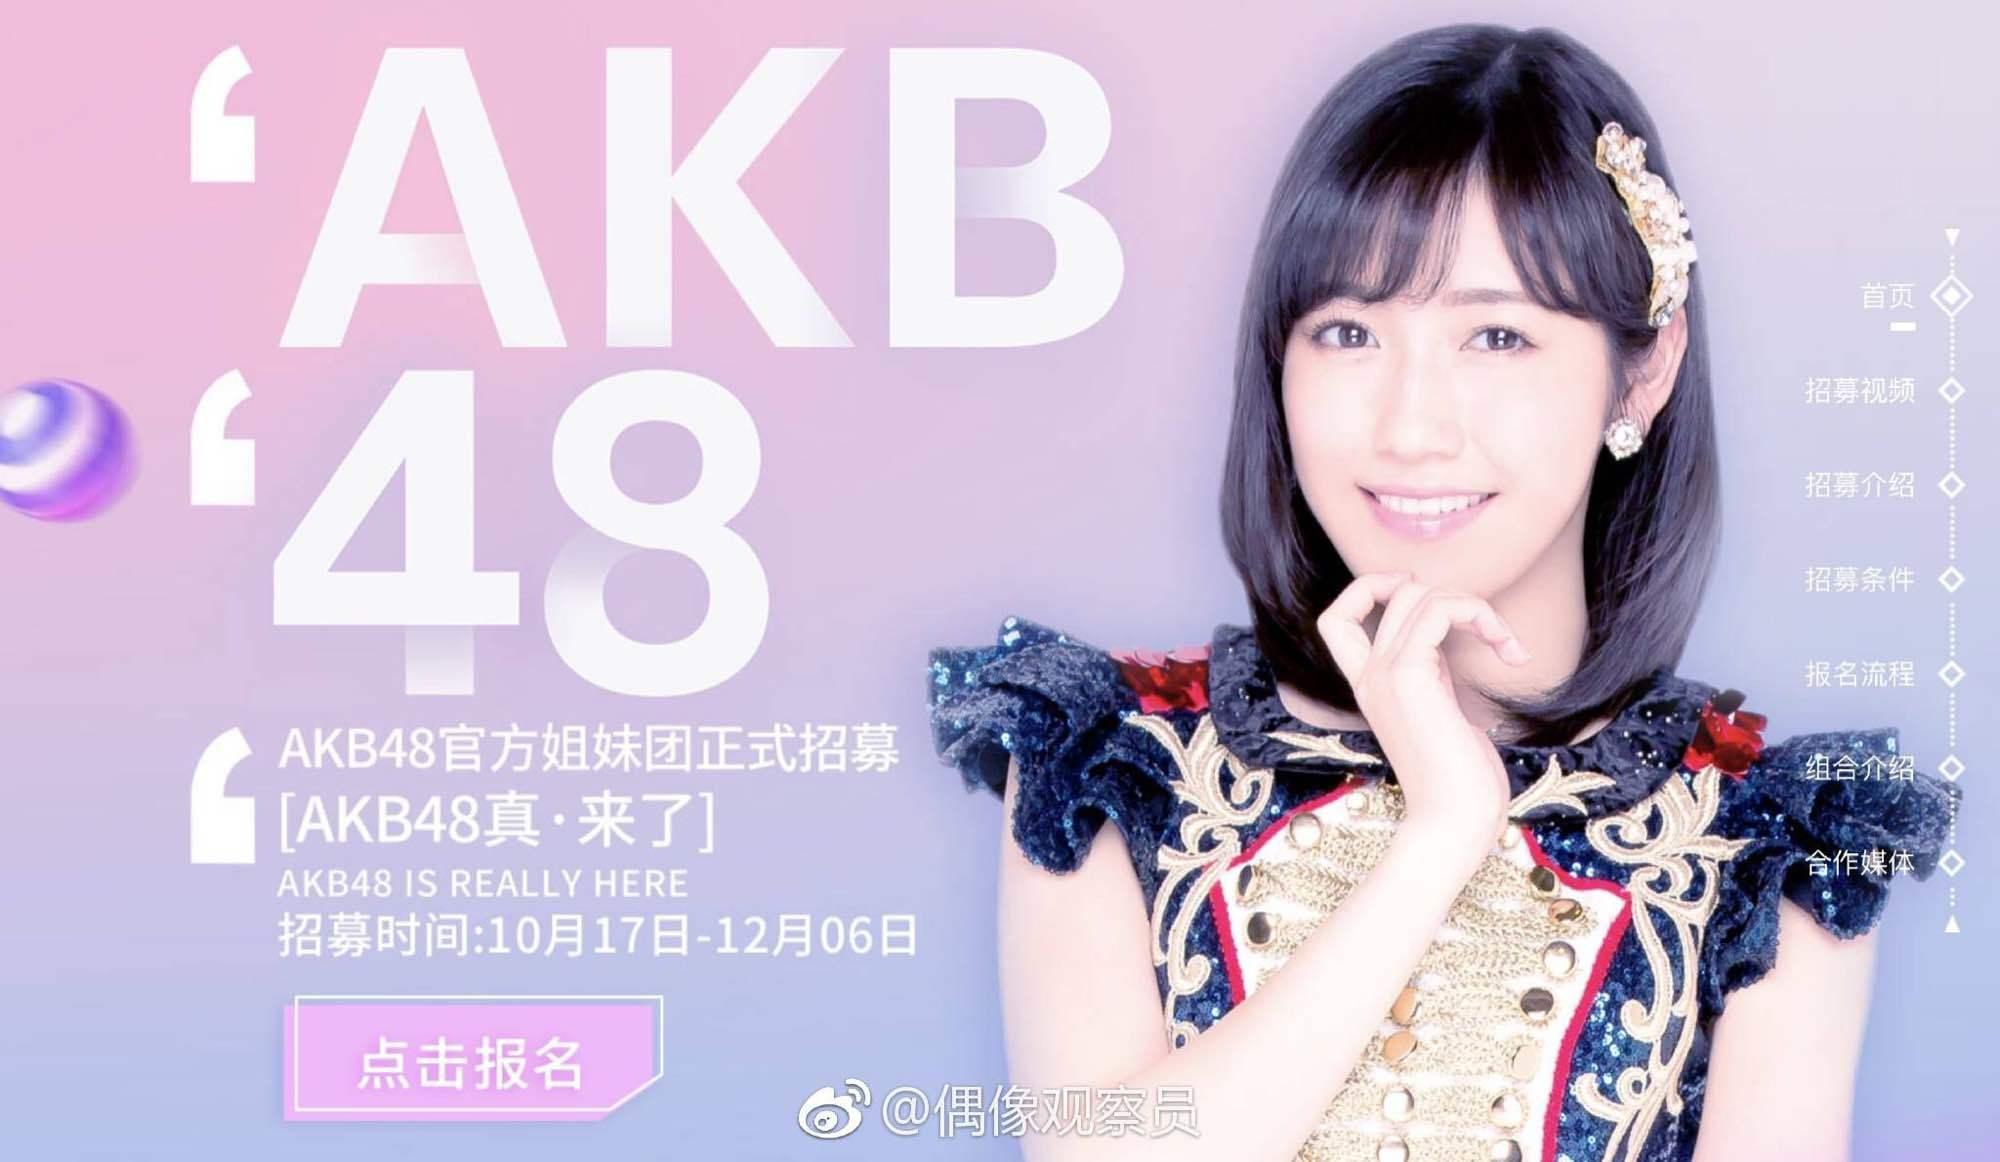 akb48_china_tieba20170928a.jpg